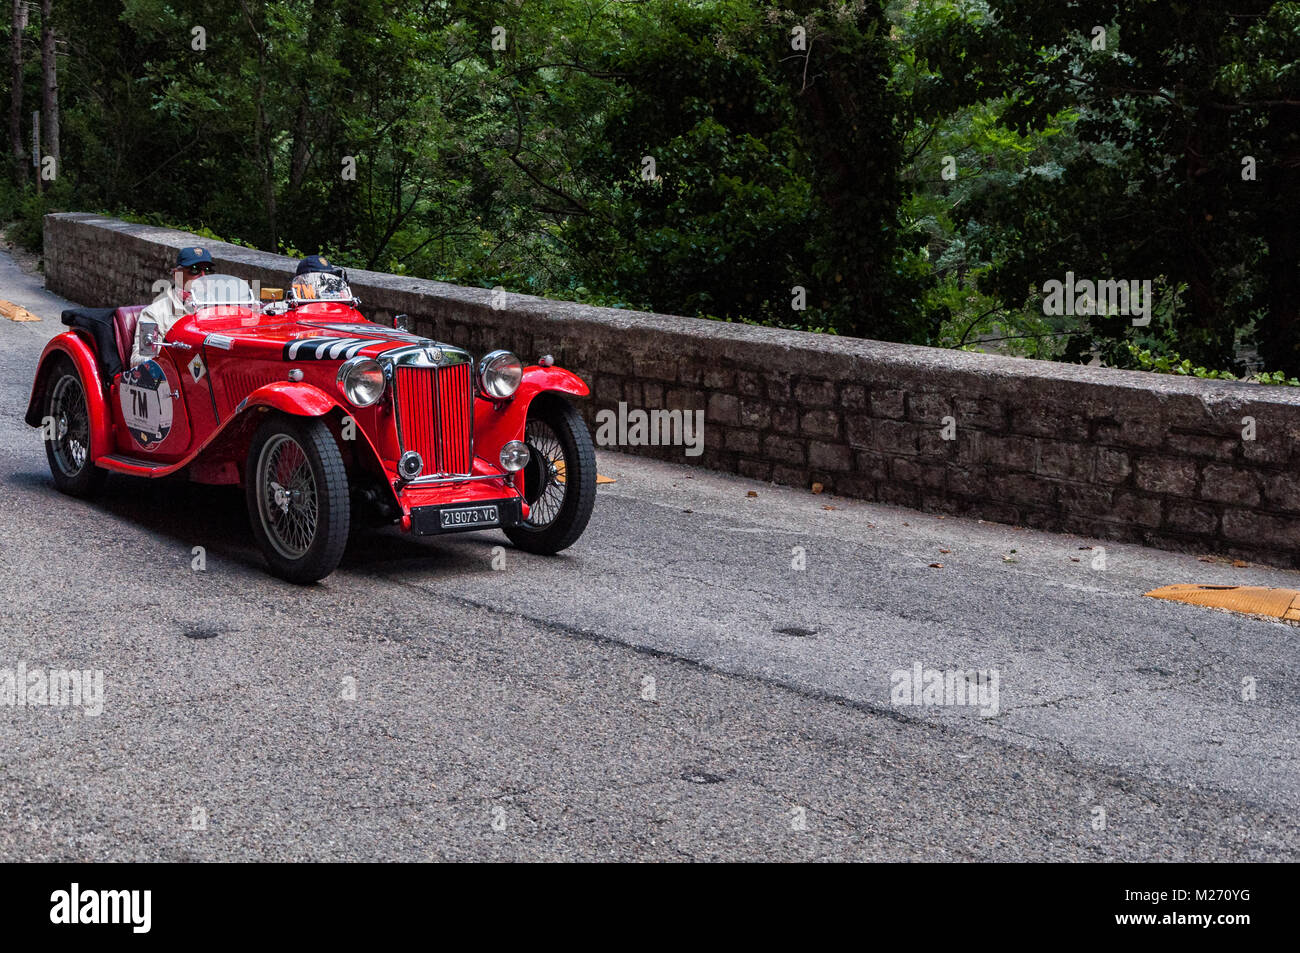 GOLA DEL FURLO, ITALY - MAY 19: MG TB 1939 on an old racing car in ...